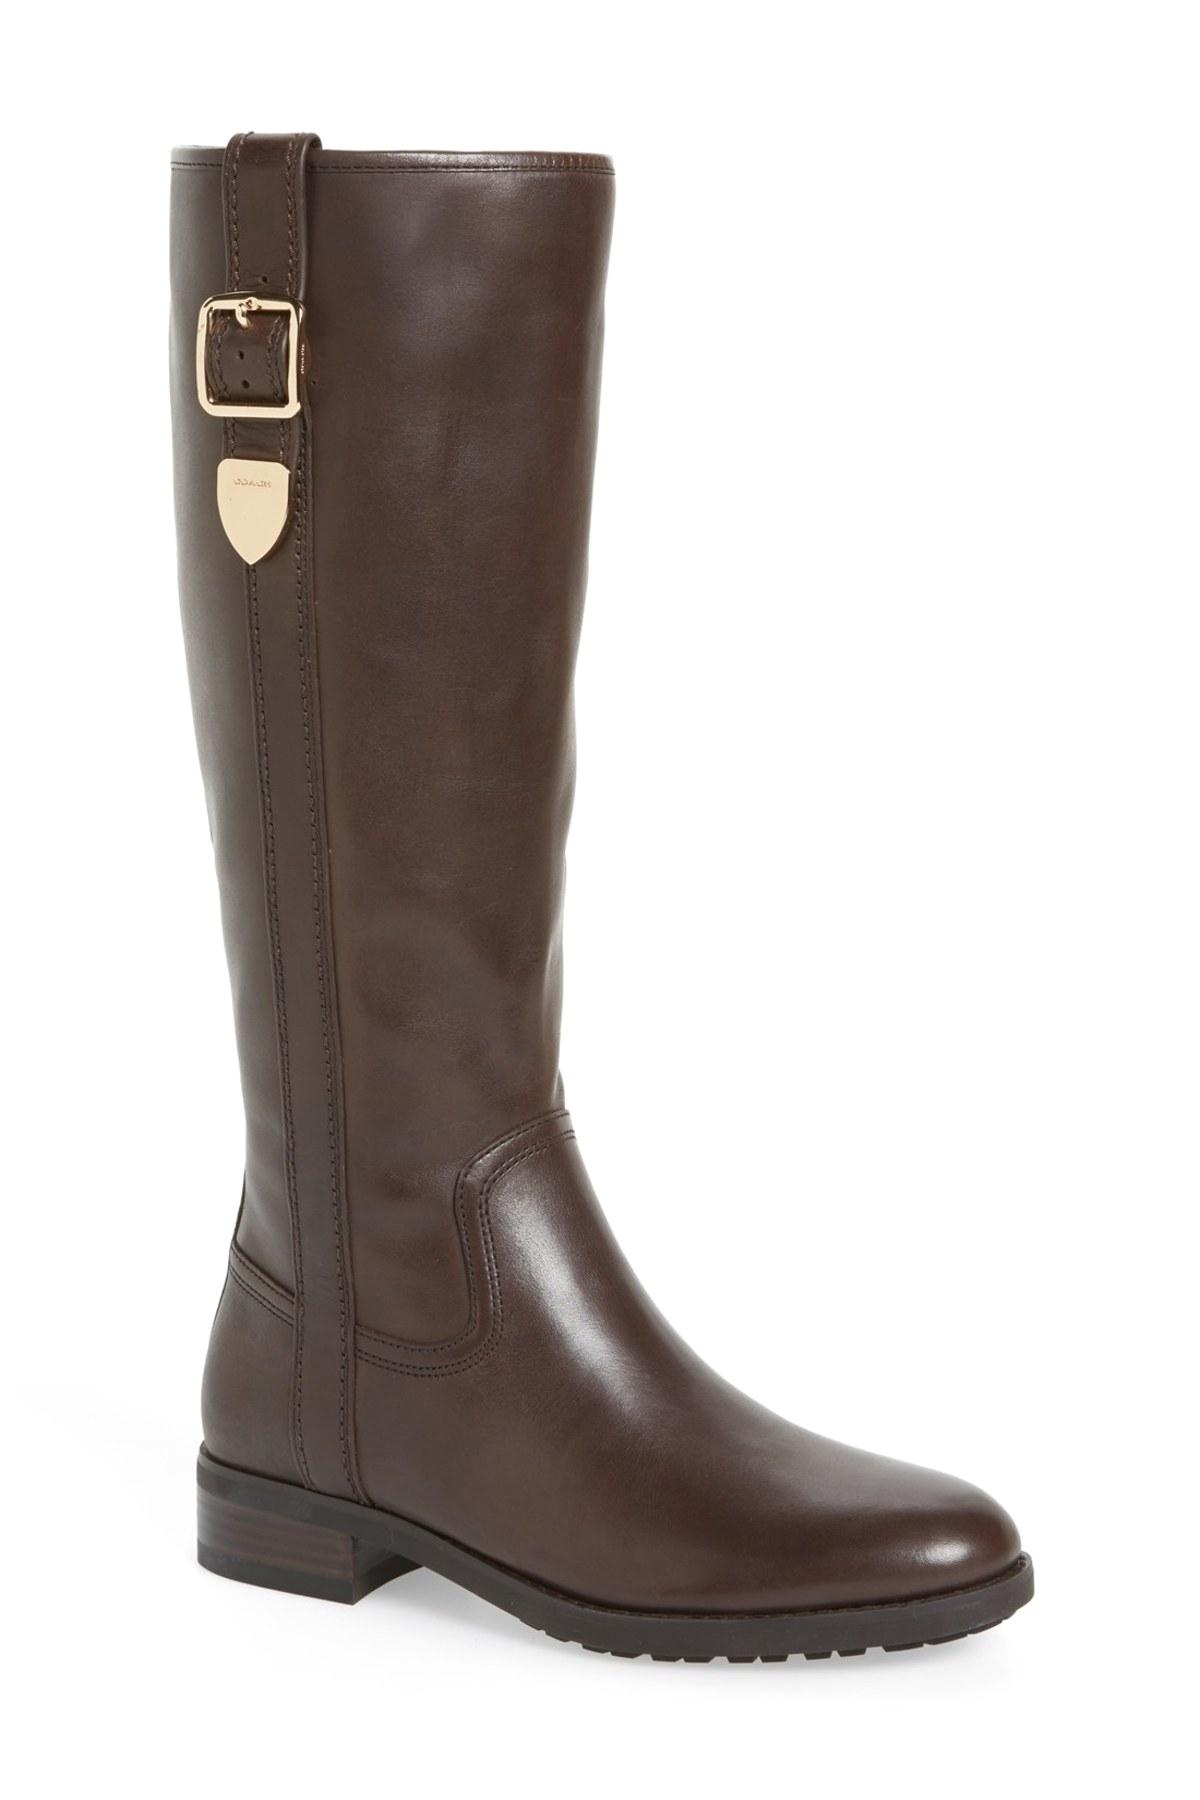 Mens Hunter Boots nordstrom Rack Coach Easton Tall Boot Women Wide Calf nordstrom Rack